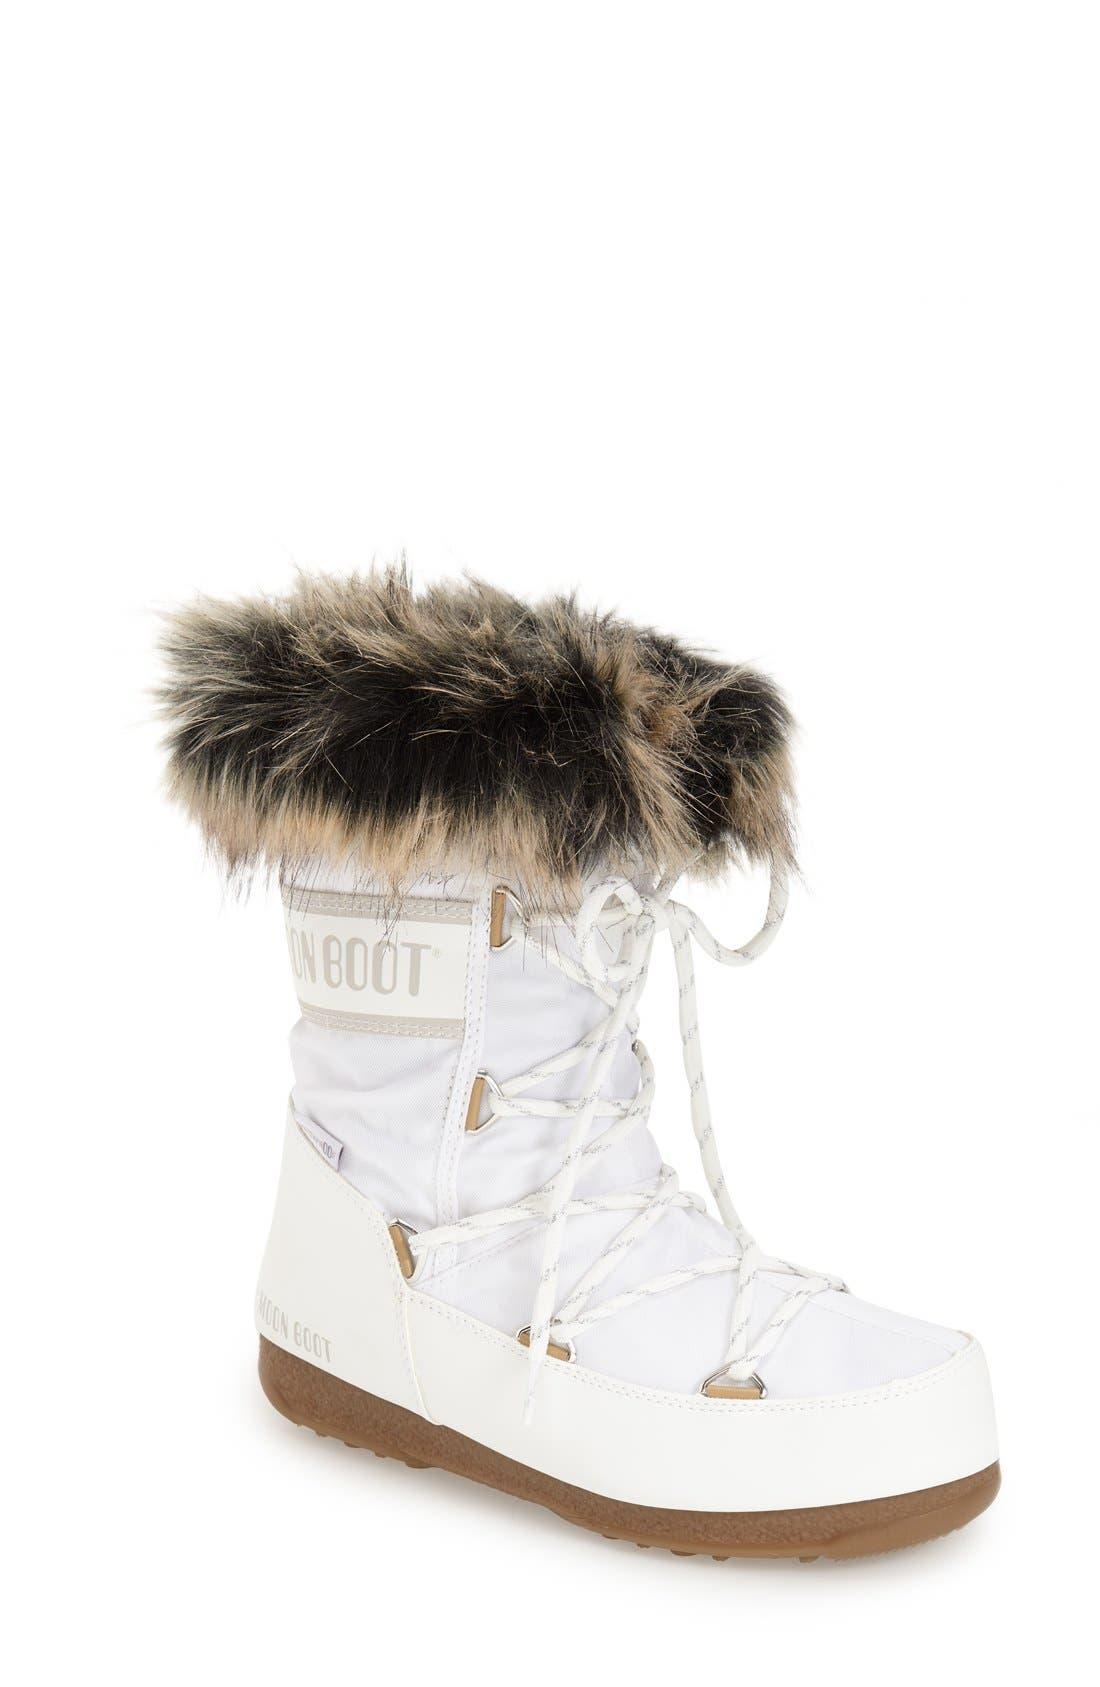 Alternate Image 1 Selected - Tecnica® 'Monaco' Waterproof Insulated Moon Boot® (Women)